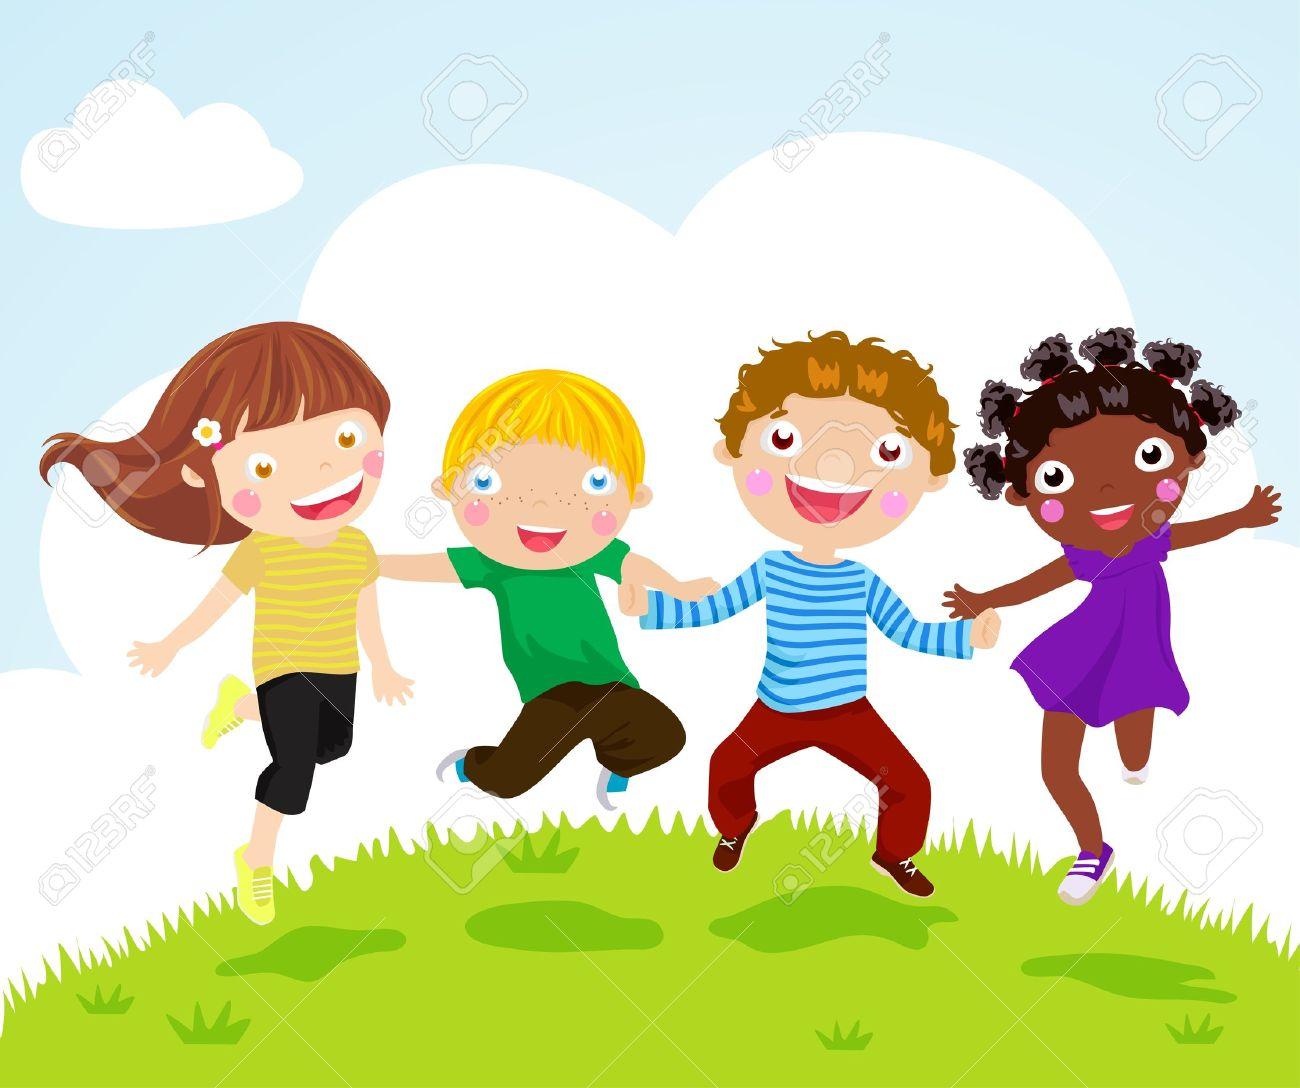 http://previews.123rf.com/images/yuyuyi/yuyuyi1209/yuyuyi120900074/15301256-Happy-jumping-kids--Stock-Vector-friends-family-happy.jpg